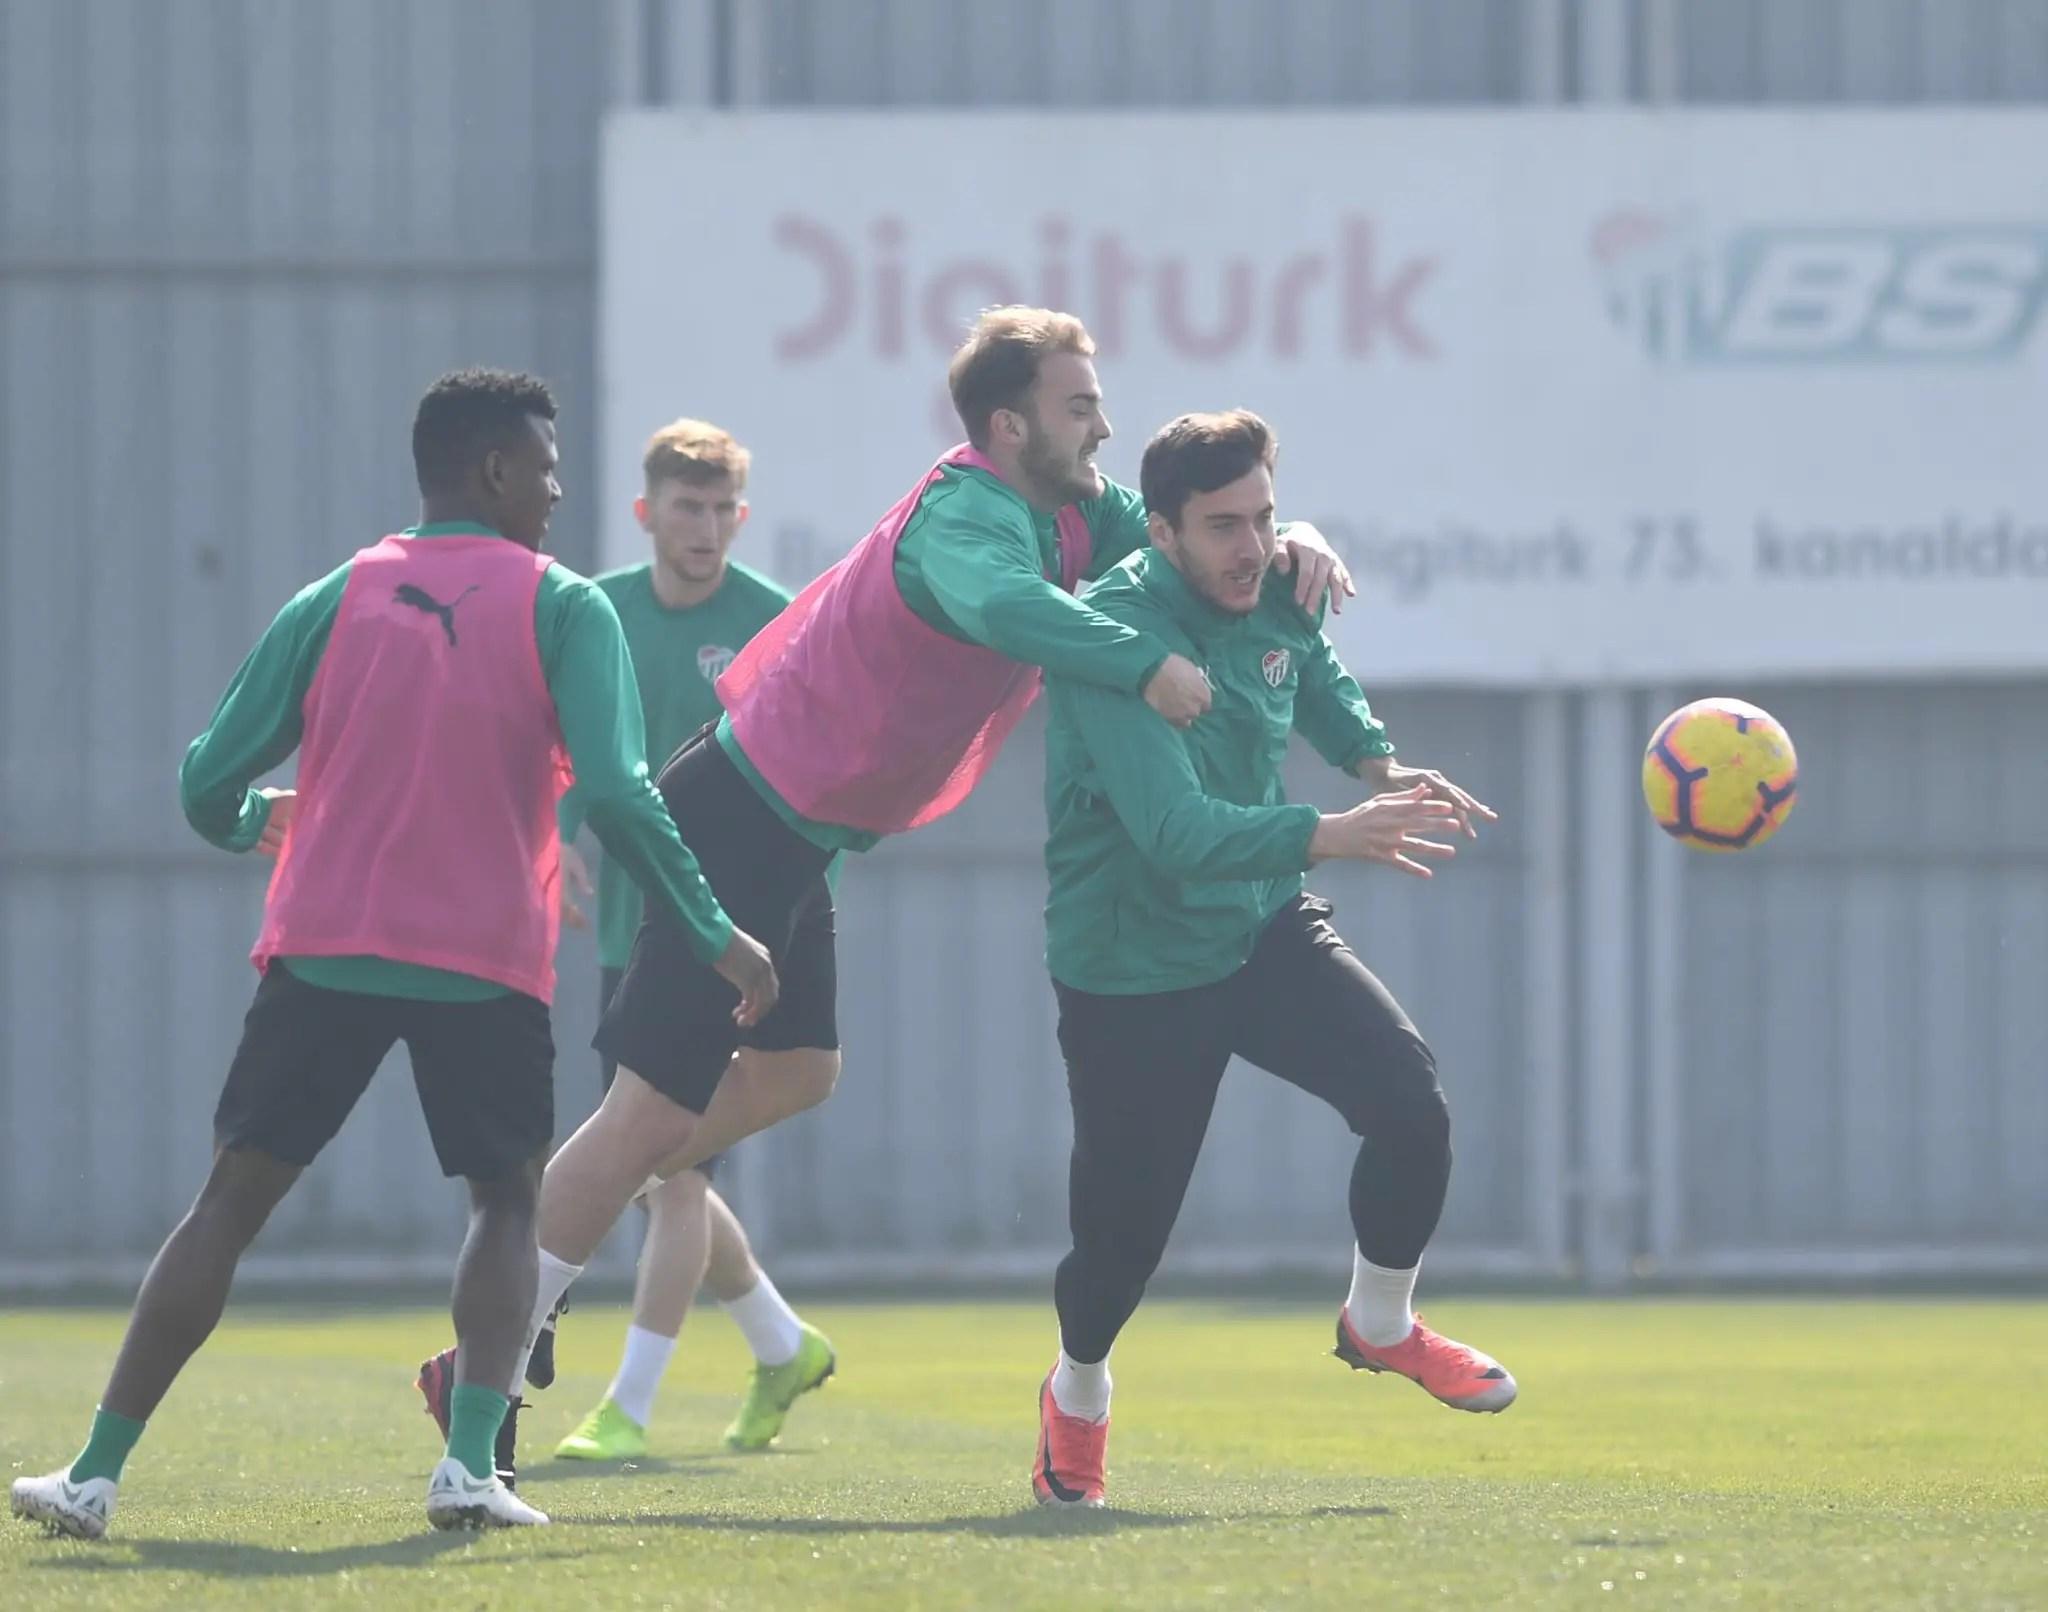 Turkish League: Abdullahi Fired Up For Bursaspor Tough Clash Vs Basaksehir